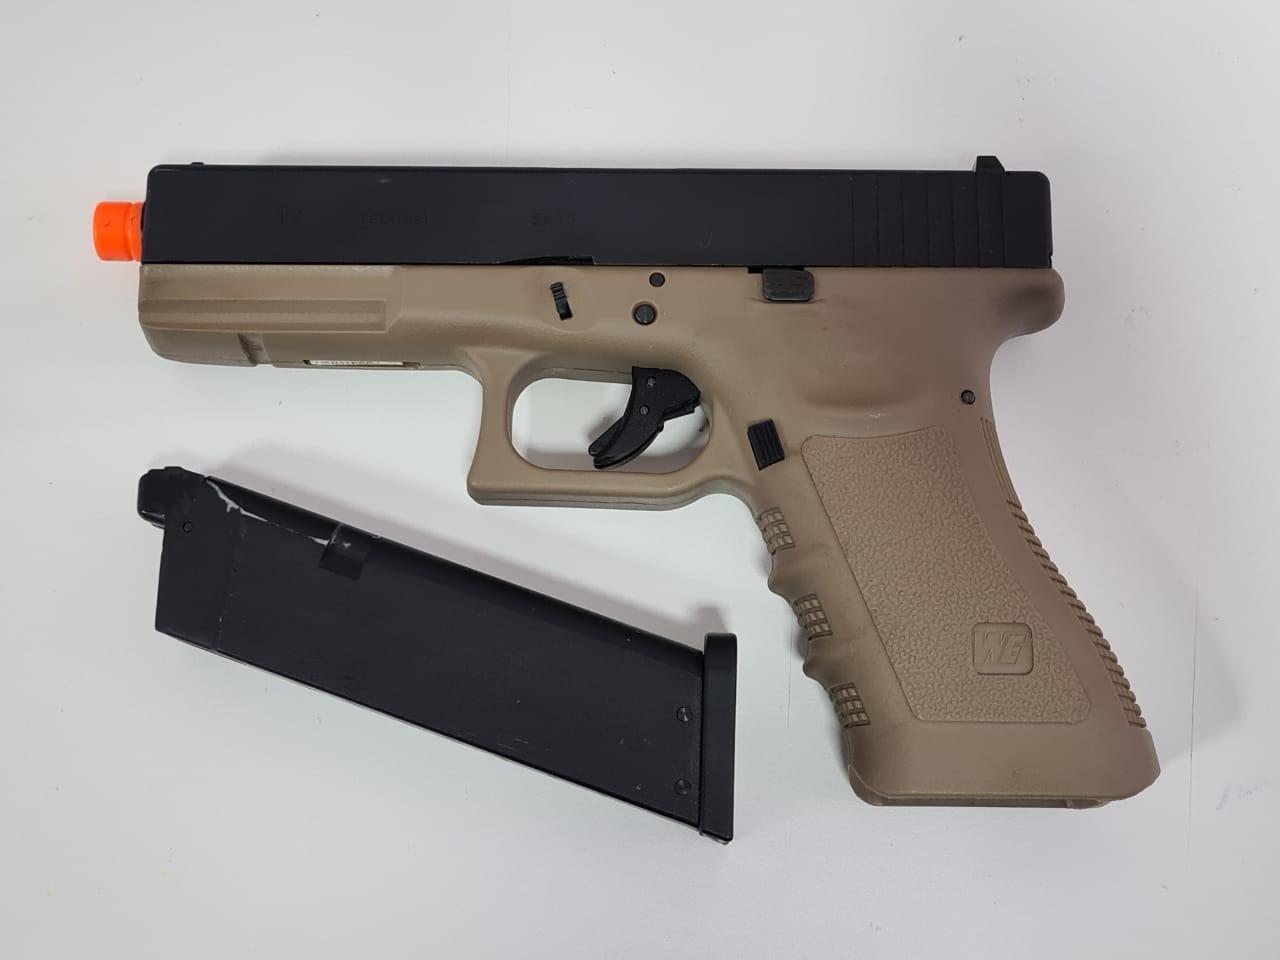 Pistola Airsoft WE Glock G17 tan Usada